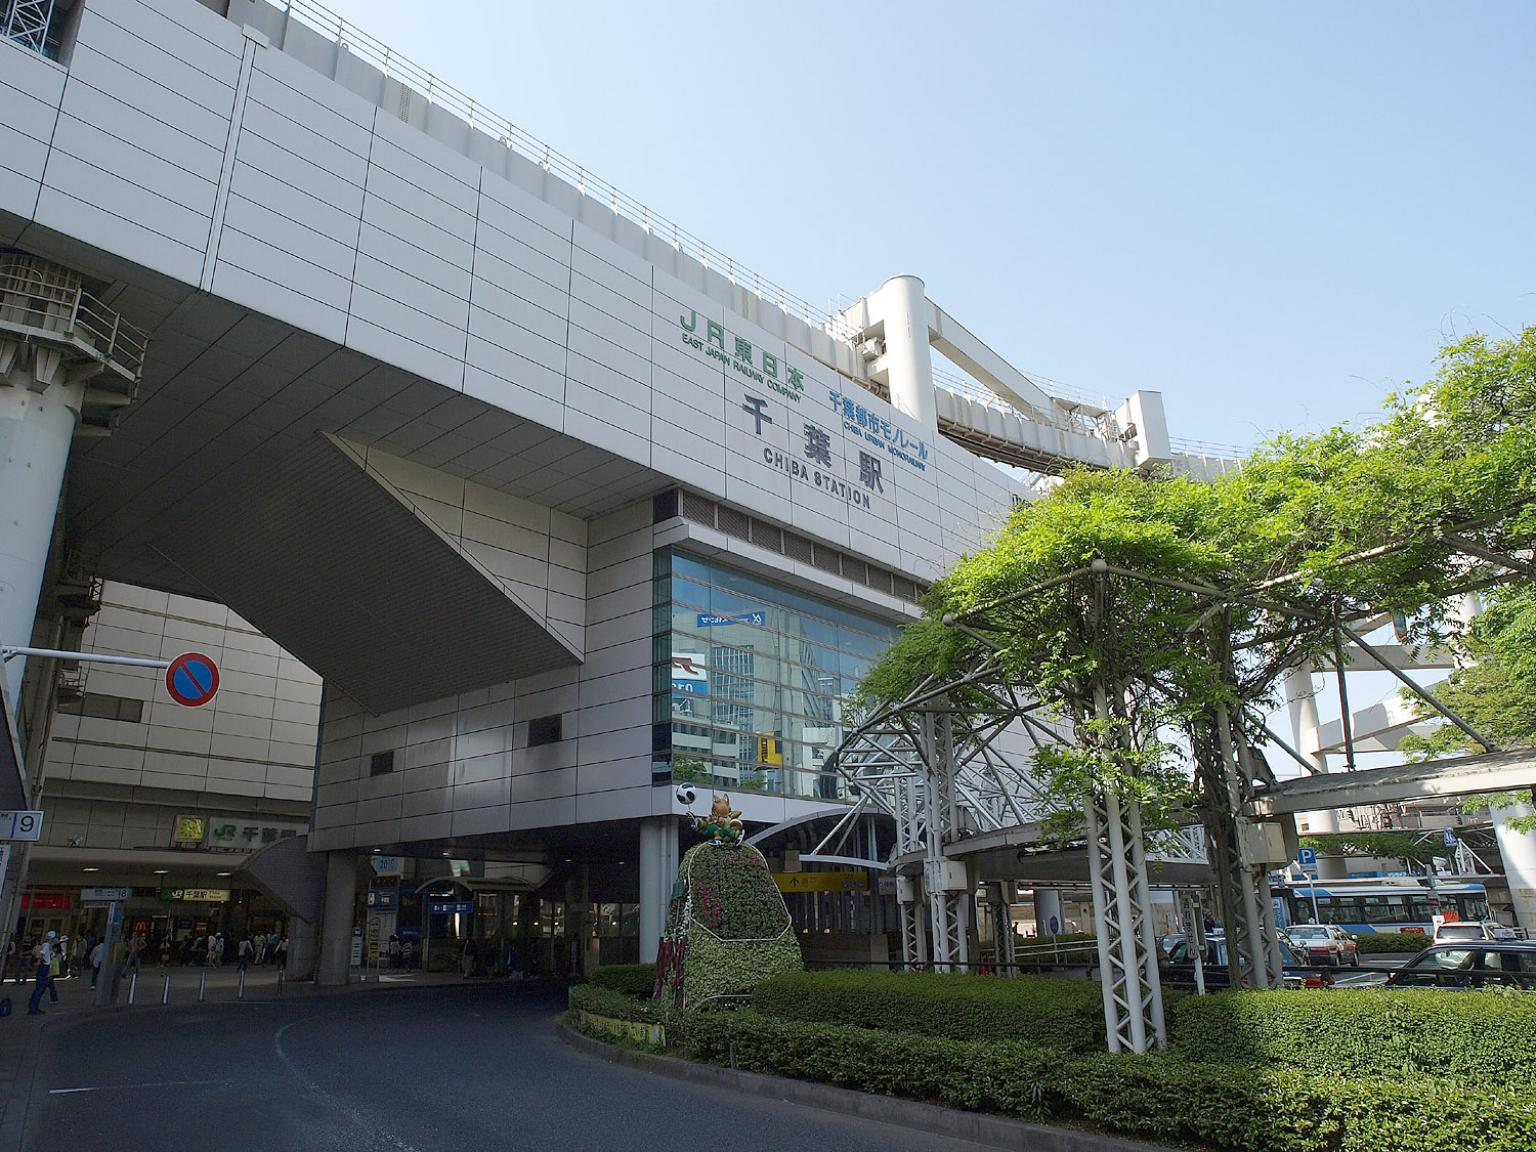 南総キングダム株式会社 千葉土地建物管理 千葉支店